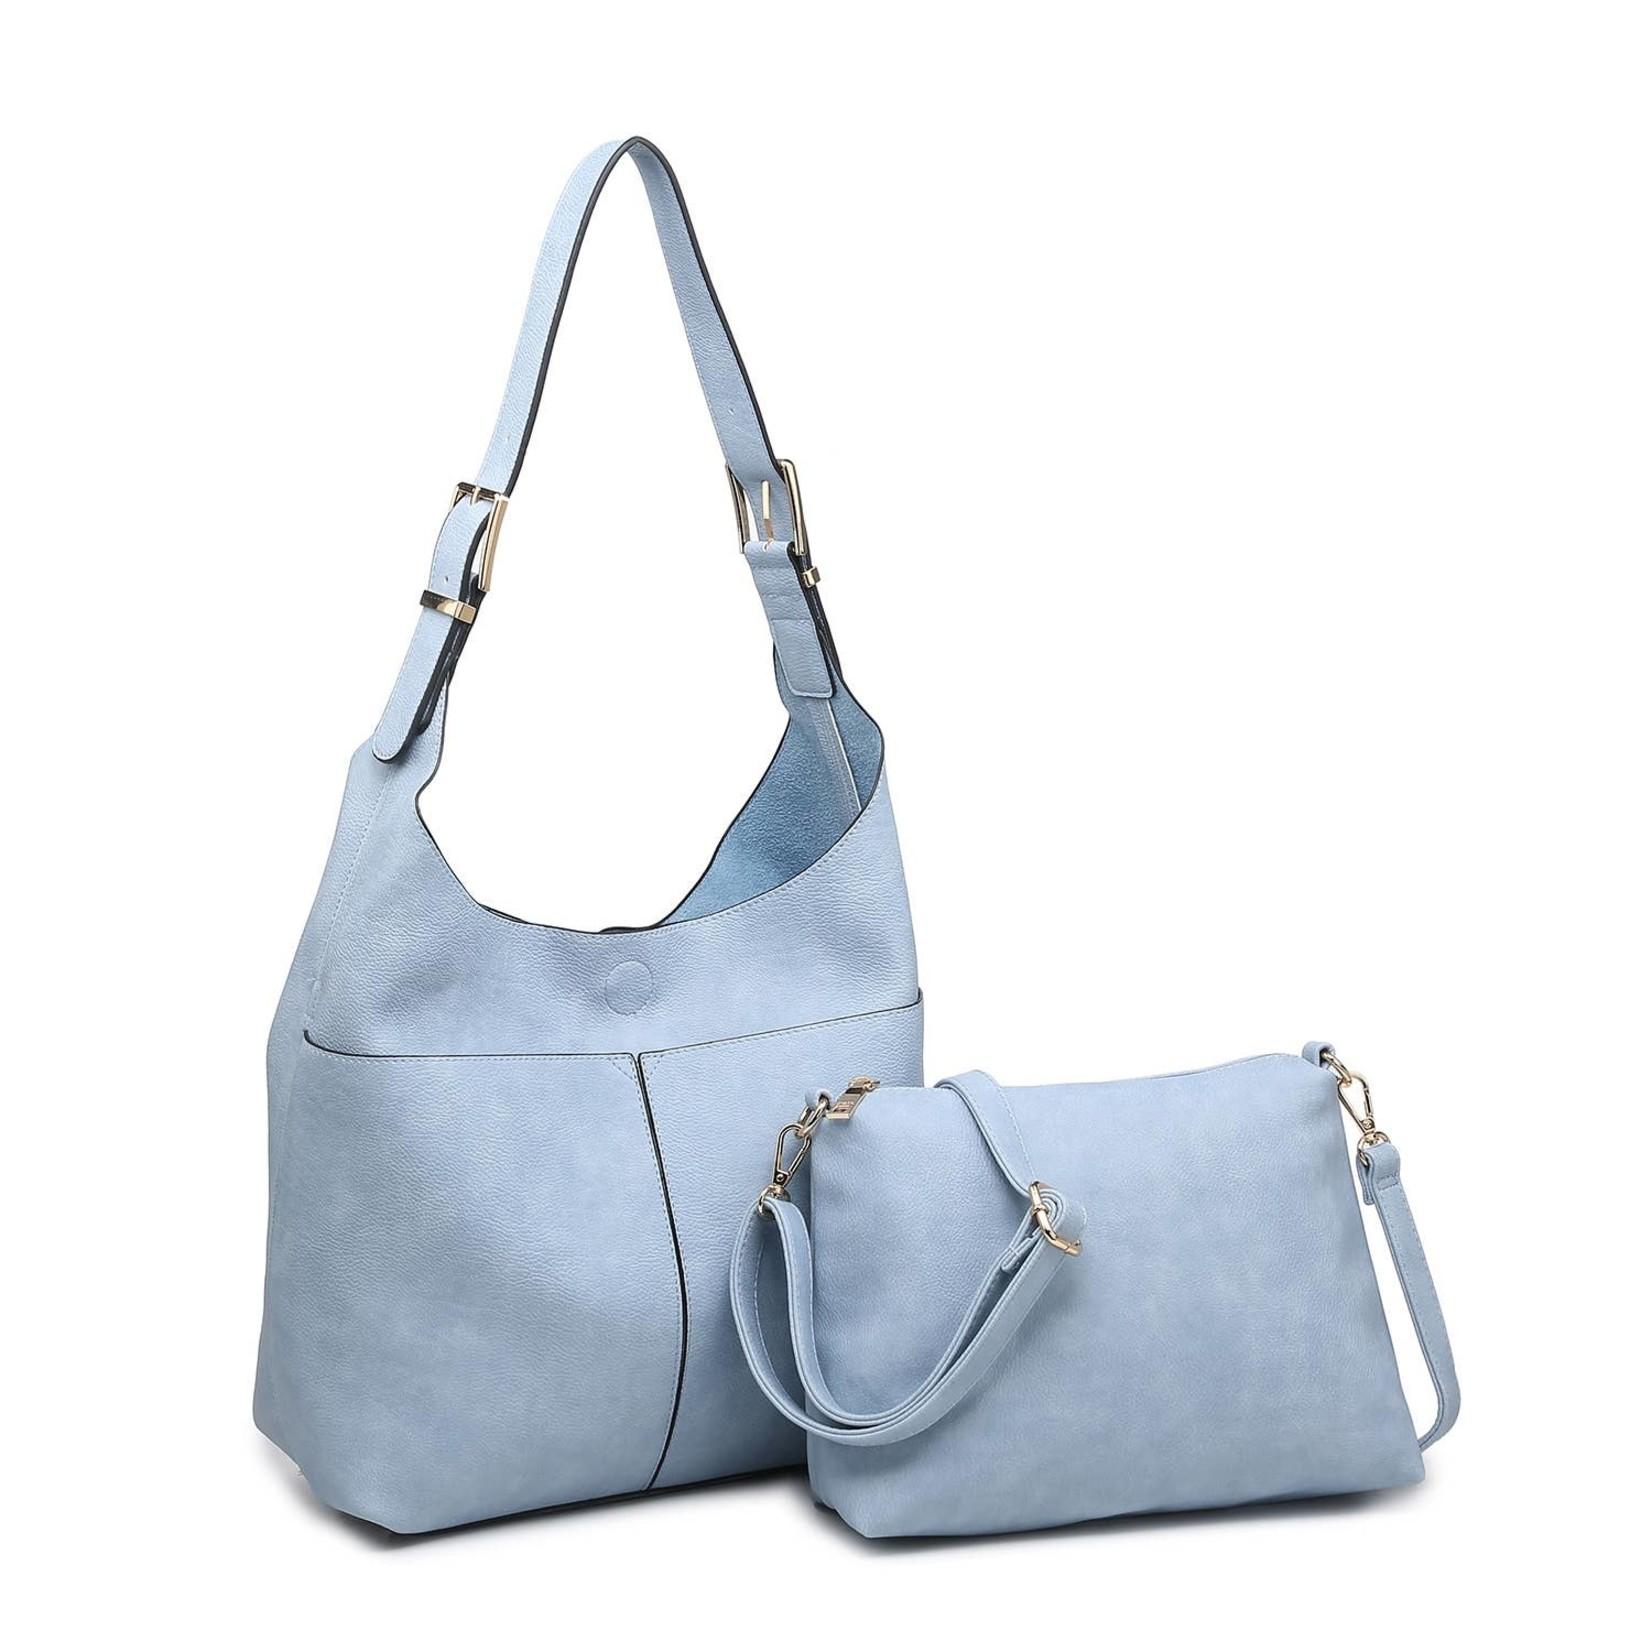 Ida Slouchy Hobo Bag w/Adjustable Strap in Cerulean Blue